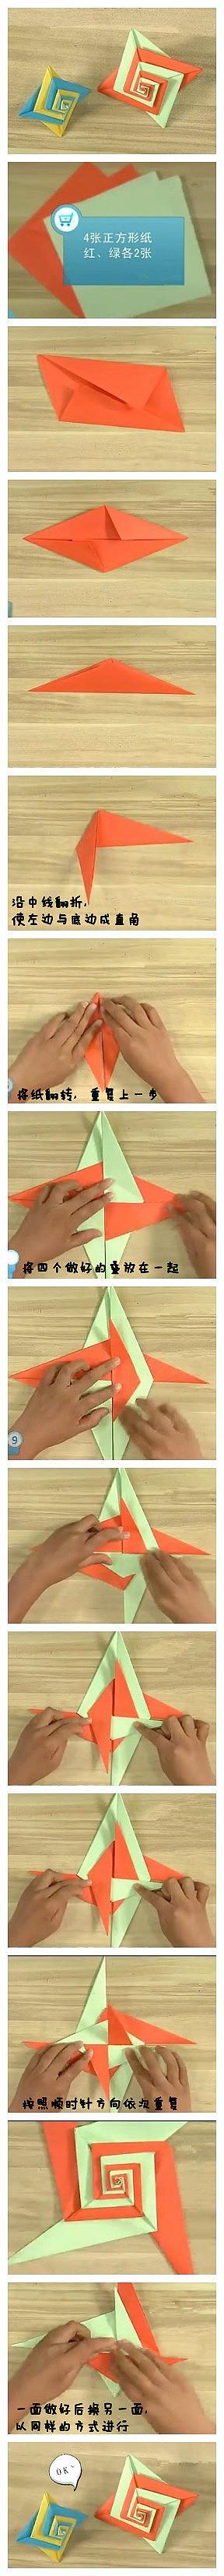 Photo diagrams for Tomoko Fuse's origami spiral.